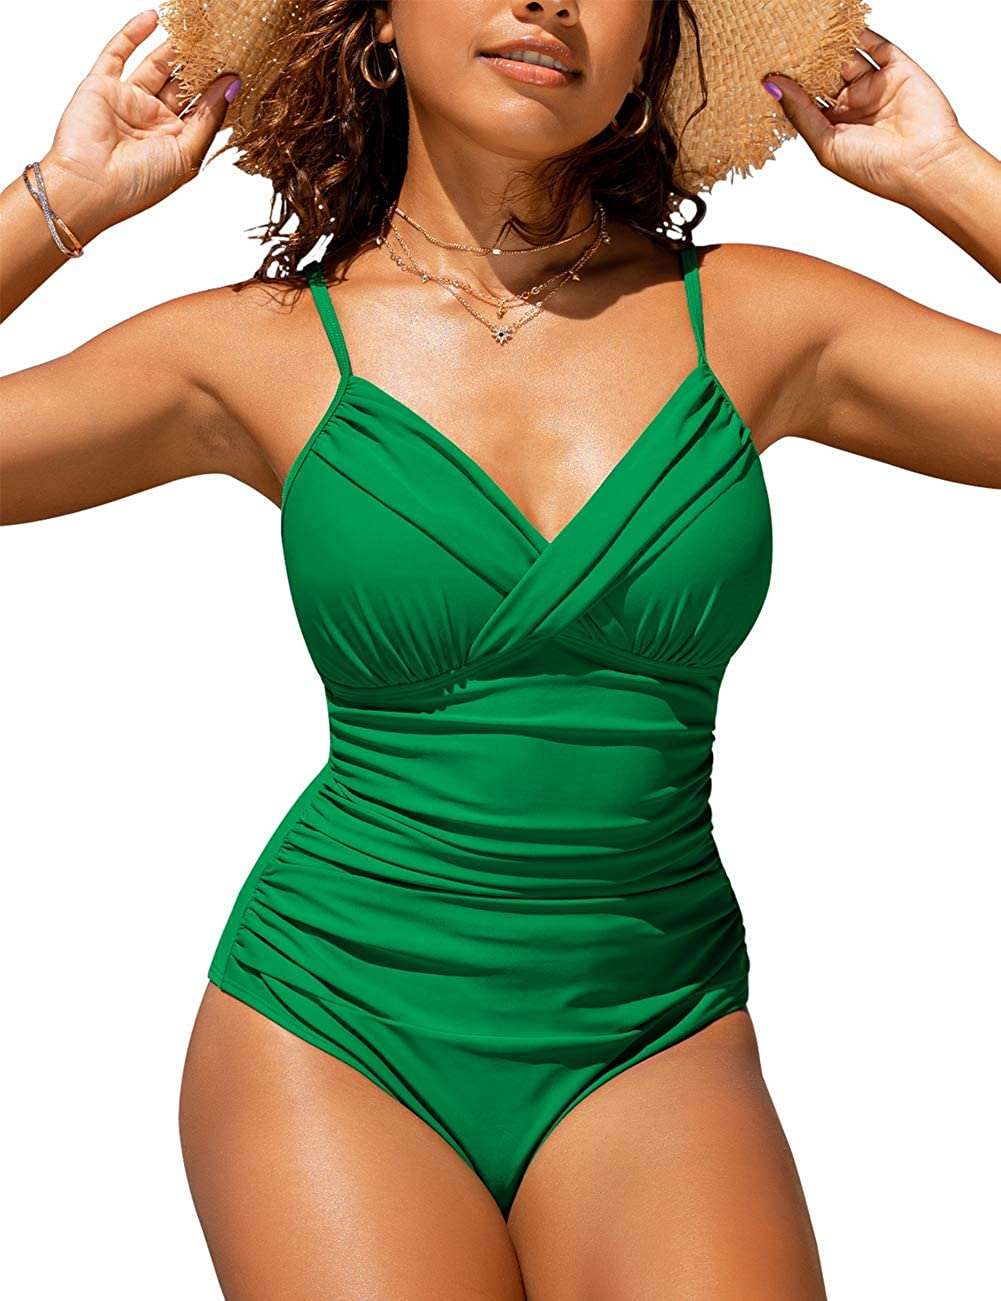 Hilor Women's One Piece Swimsuits Front Twist Swimwear V Neck Shirred Bathing Suit Monokini Tummy Control